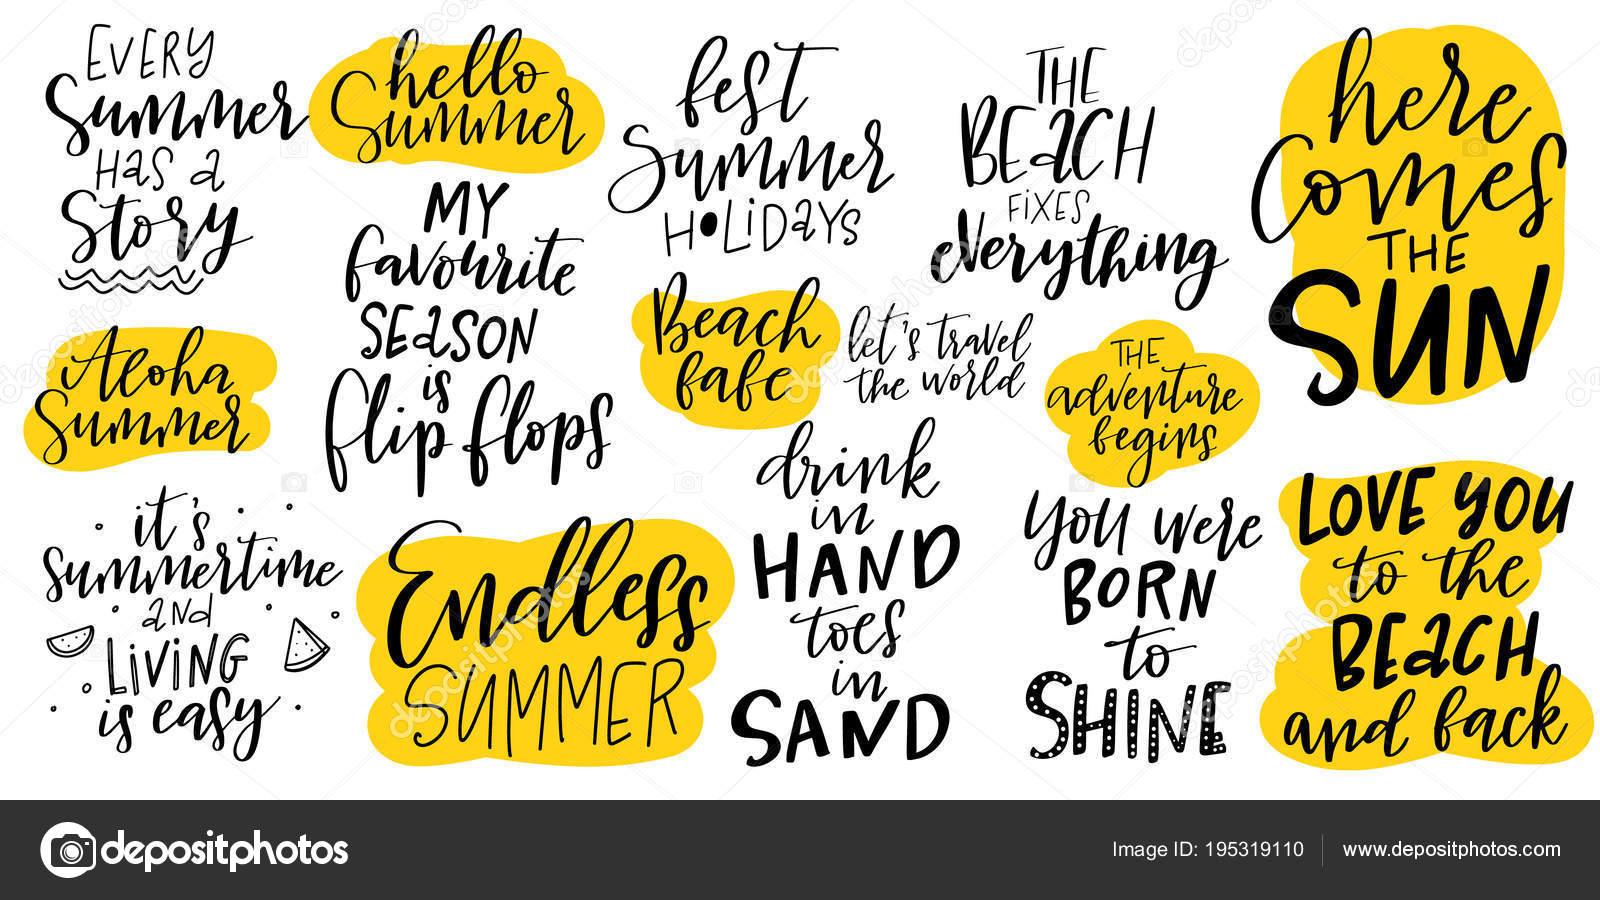 Inspirational Summer Quotes - HD Wallpaper